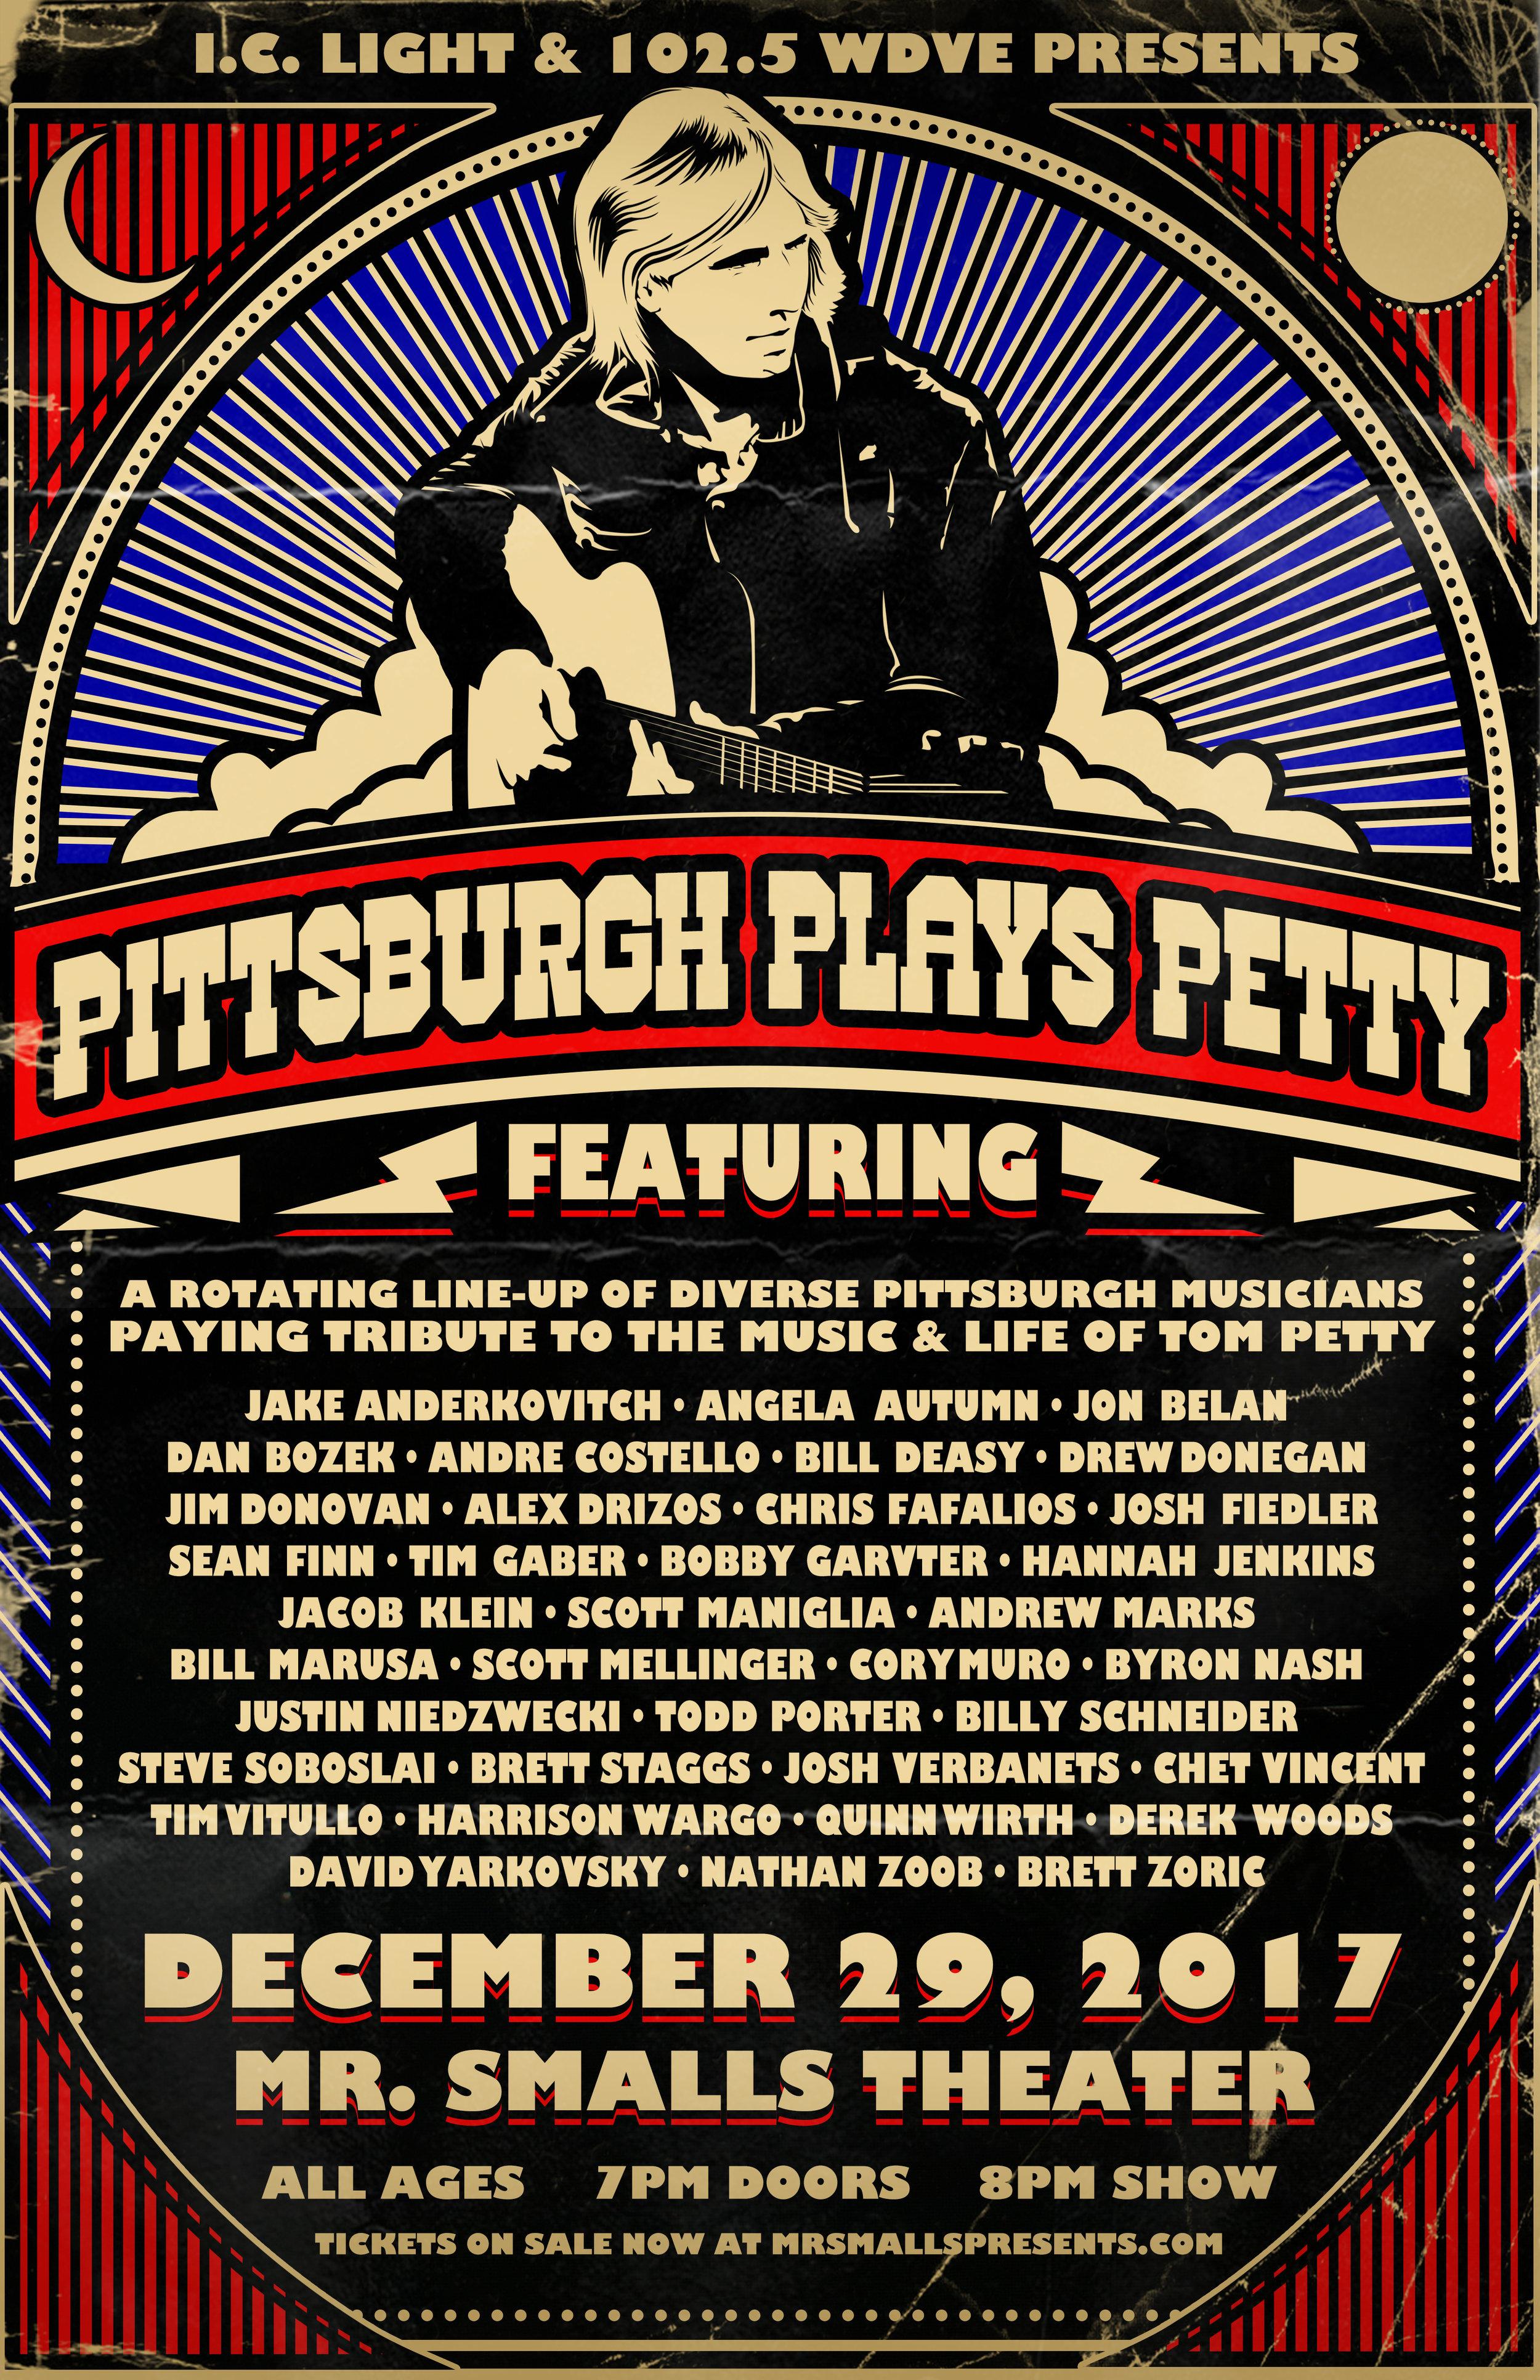 PittsburghPlaysPetty_Admat_WebUse.jpg